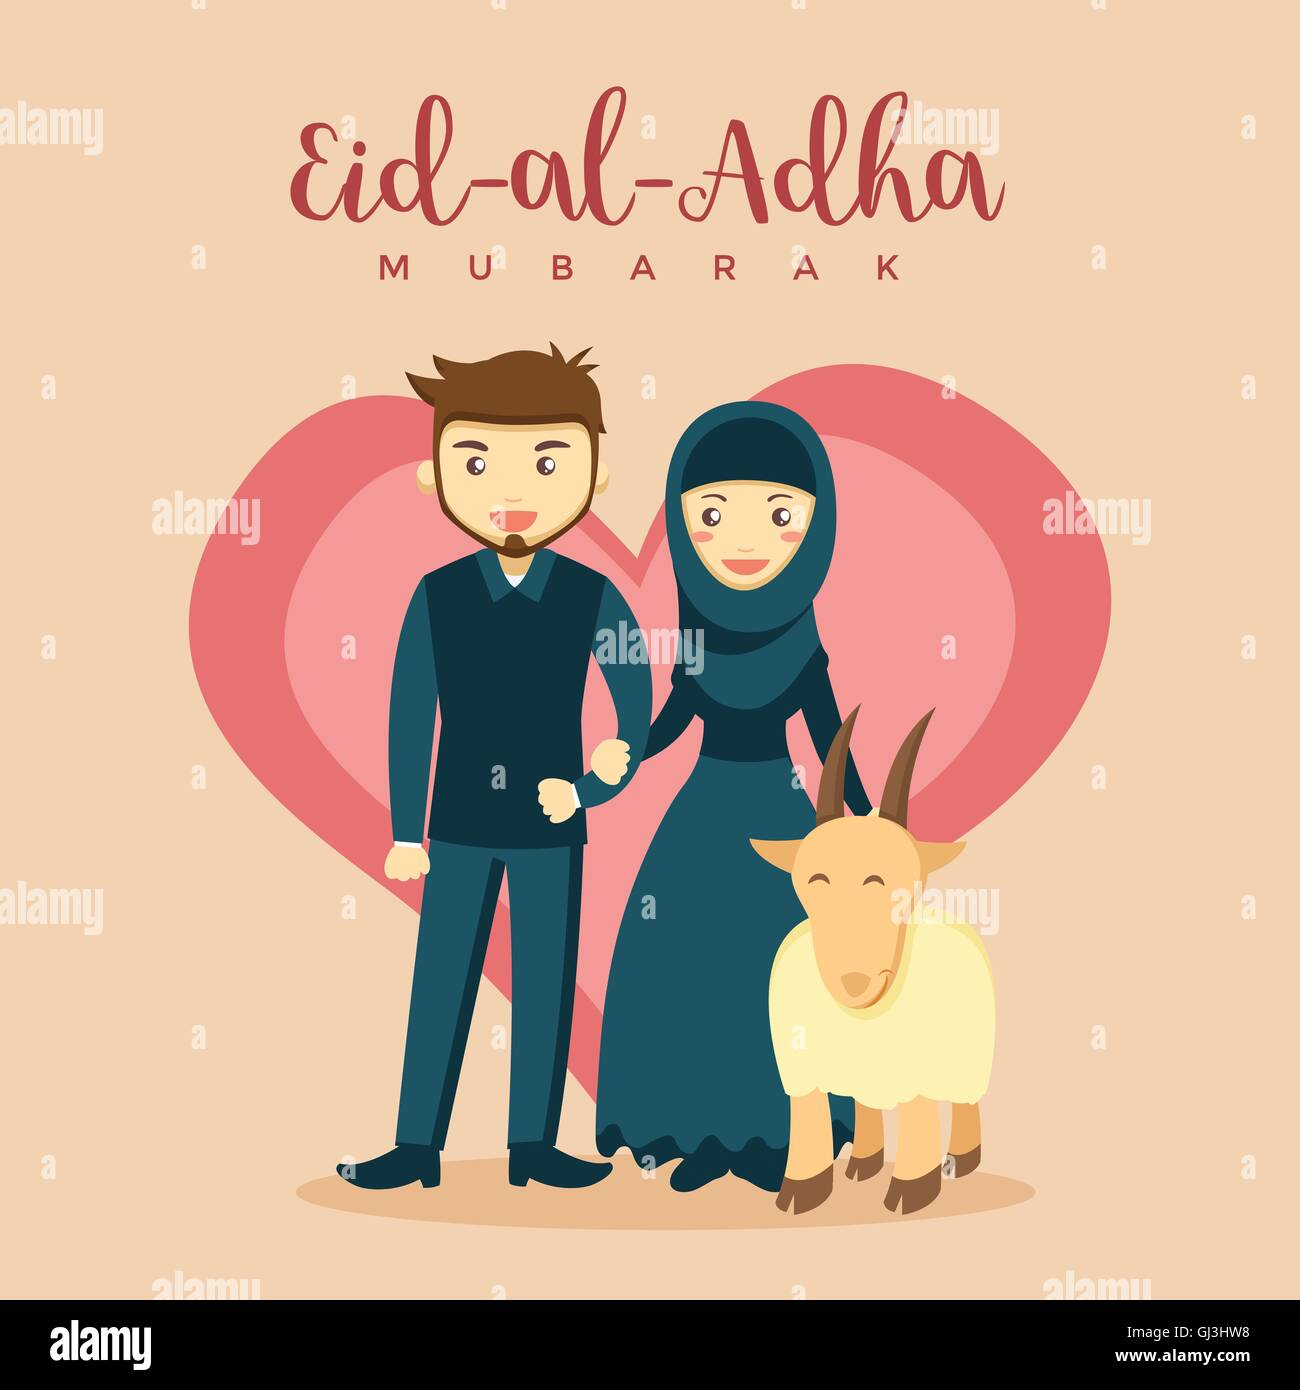 Muslim couple eid al adha greeting card love qurban stock vector muslim couple eid al adha greeting card love qurban kristyandbryce Images